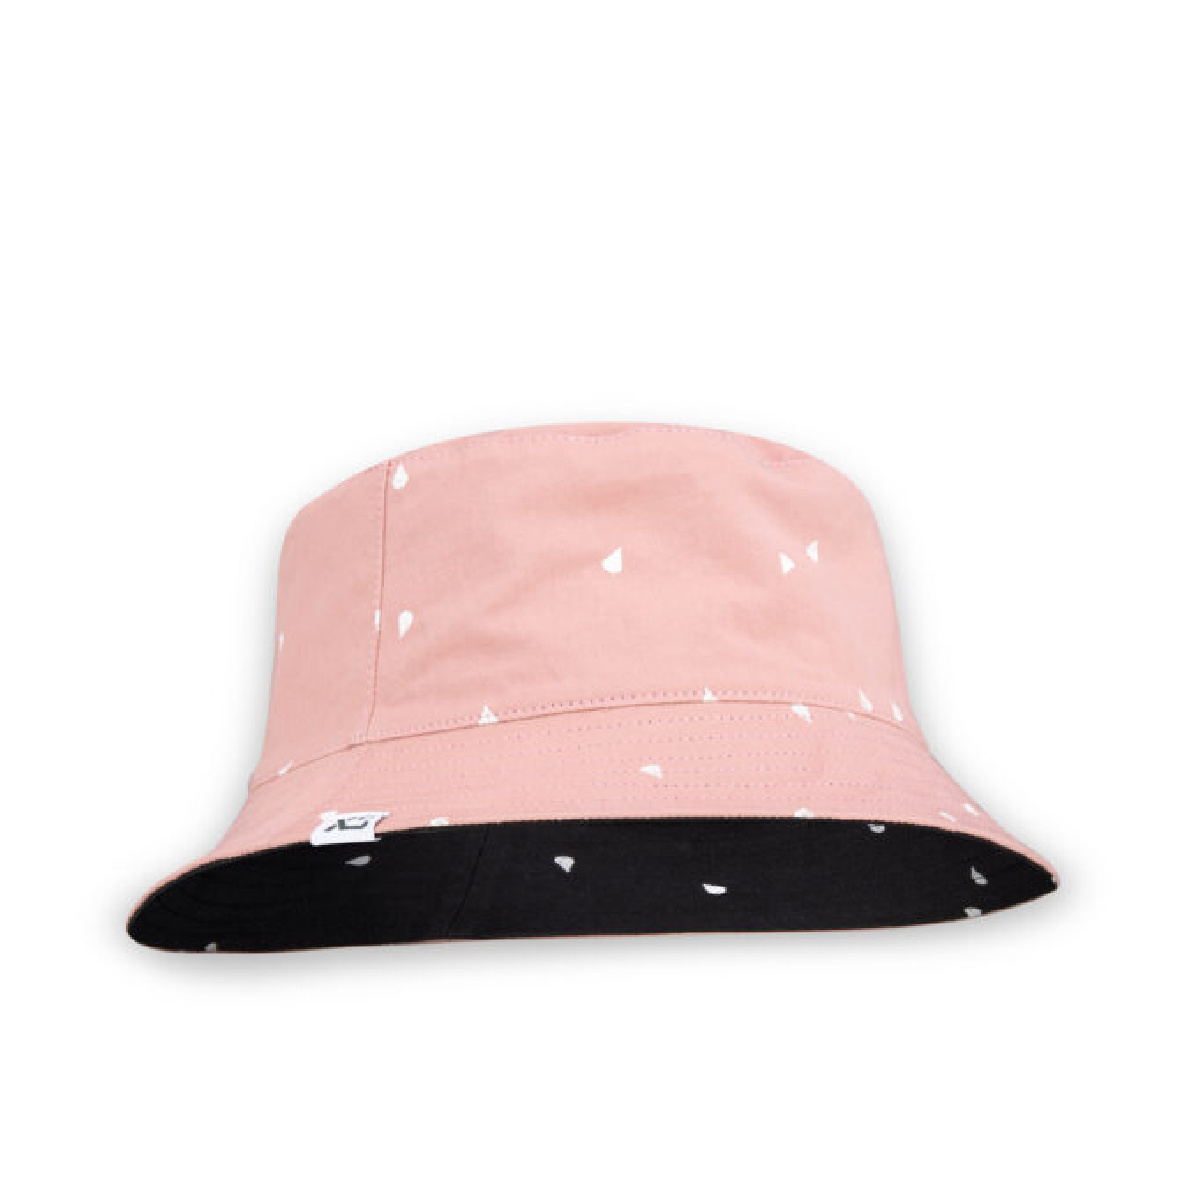 XS Unified XS Unified Kids Bucket Hat Rose Minidrop